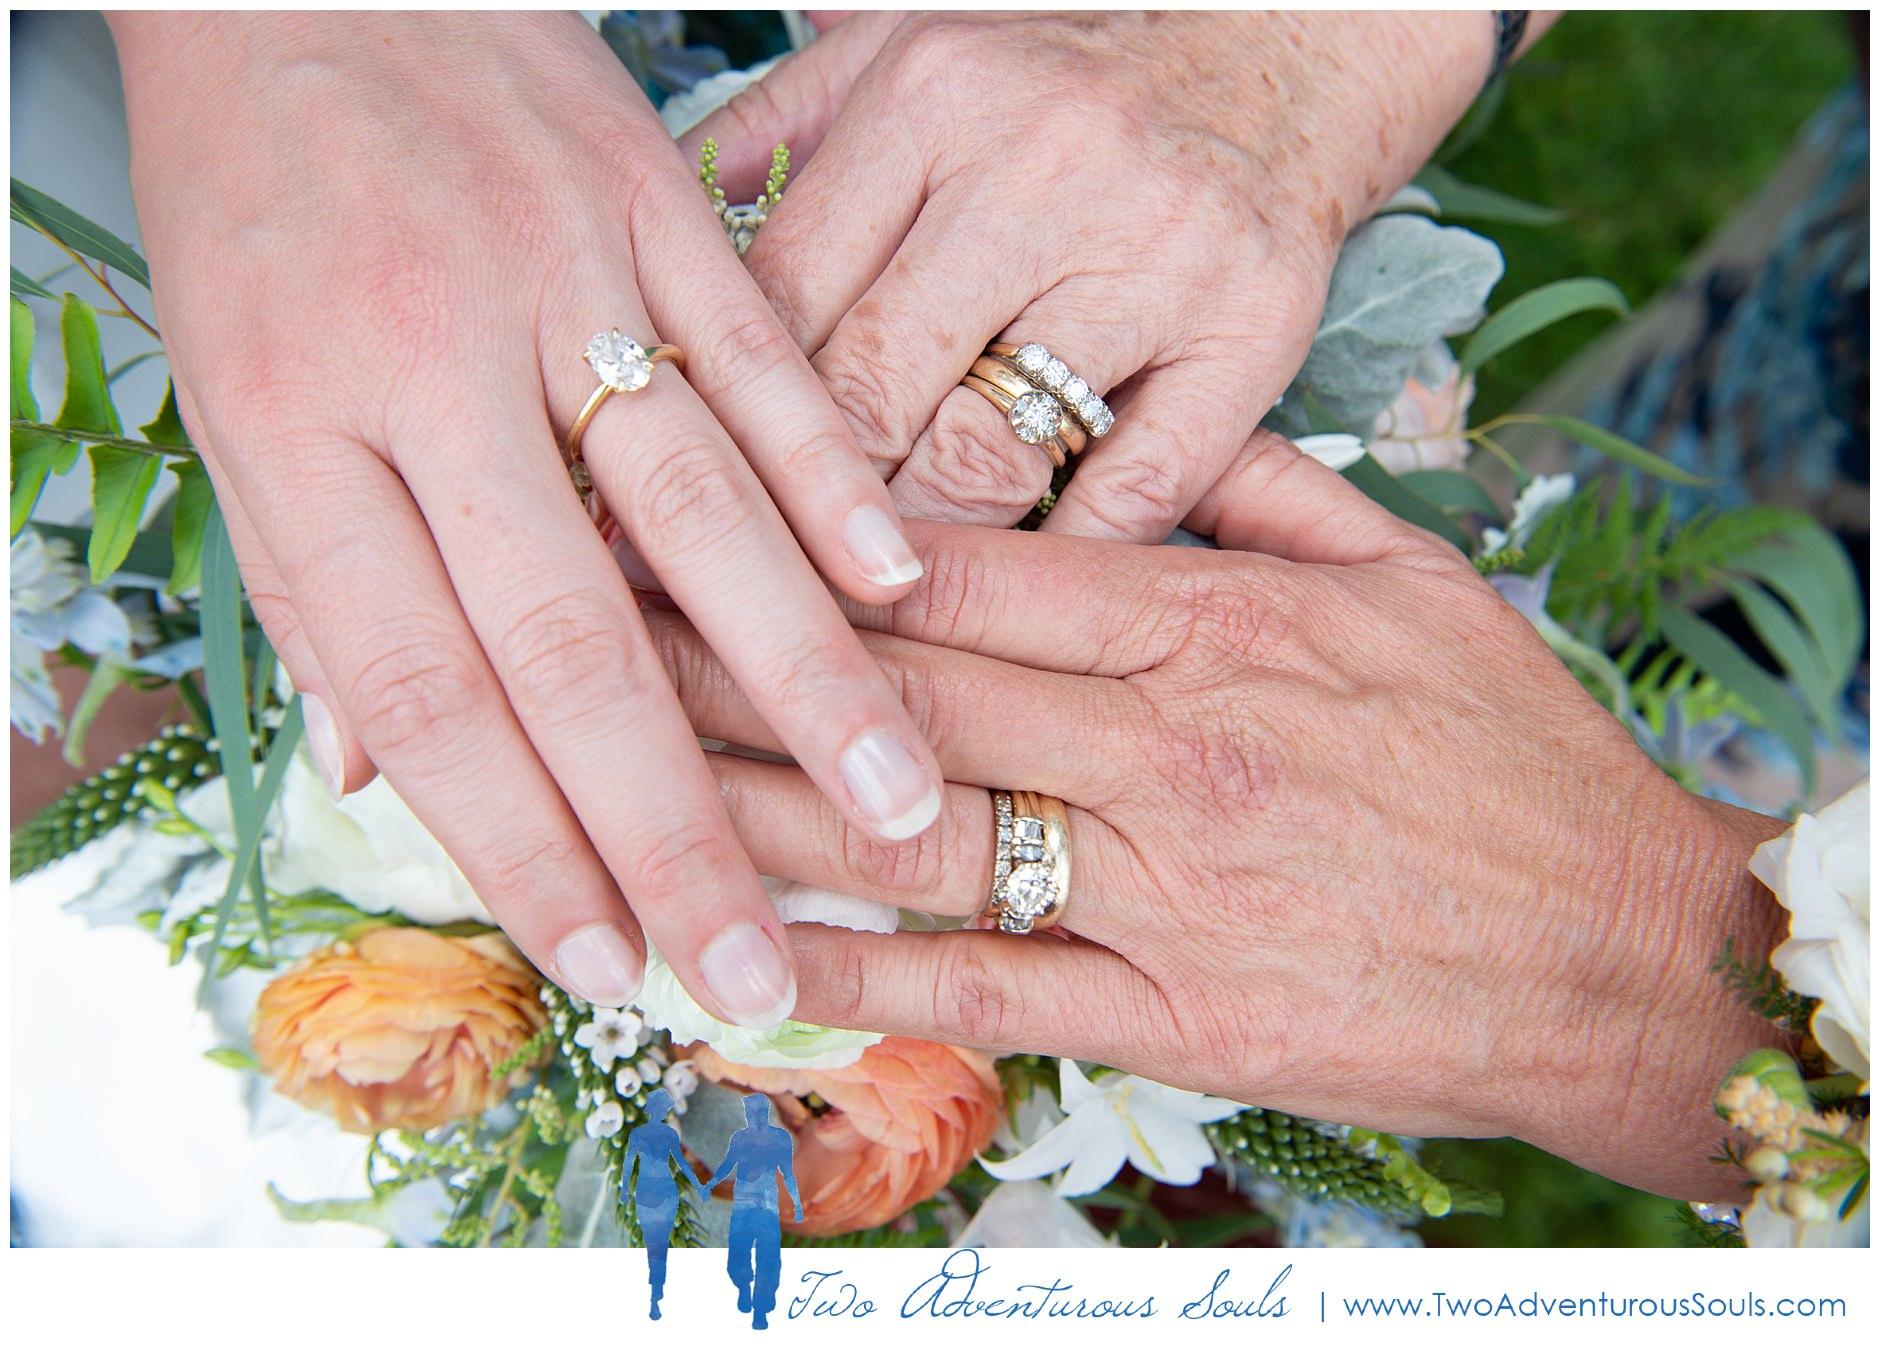 Maine Wedding Photographers, Point Lookout Wedding Photographers, Maine Elopement Photographers, Two Adventurous Souls-0080419_0026.jpg